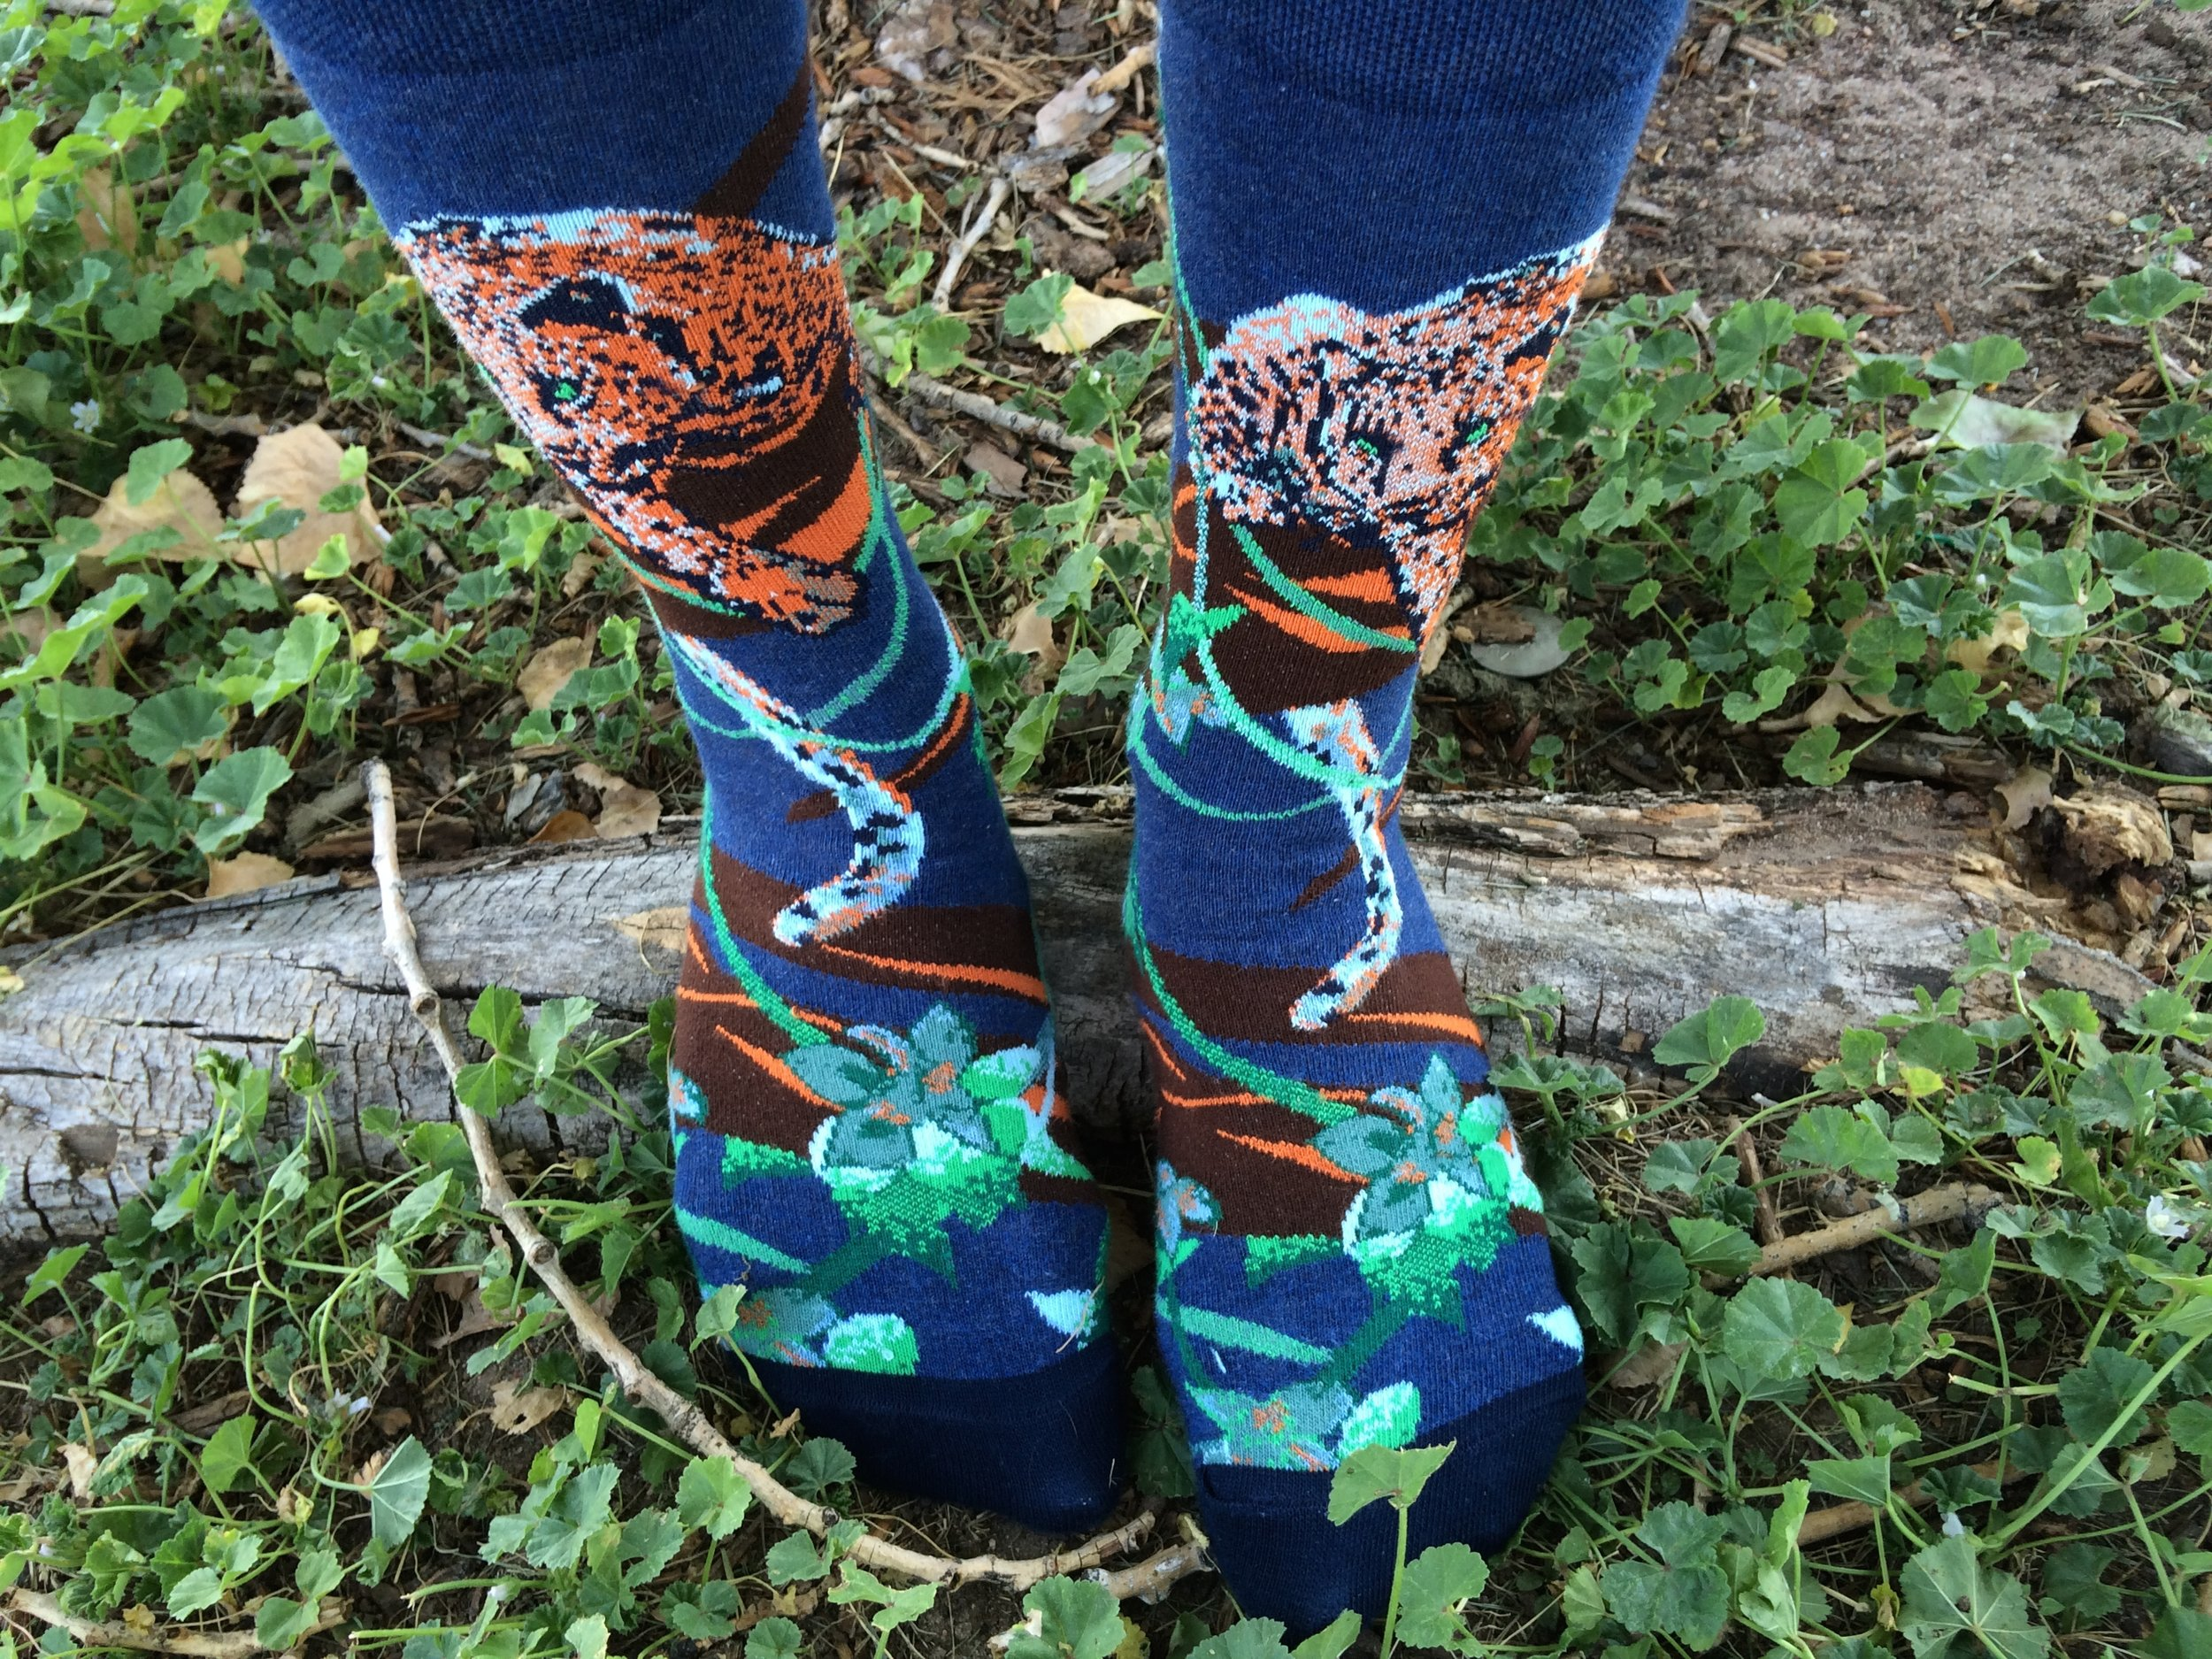 """Endangered Cats Jaguar Socks"" Style - Photo Credit: Jess Doutrich"